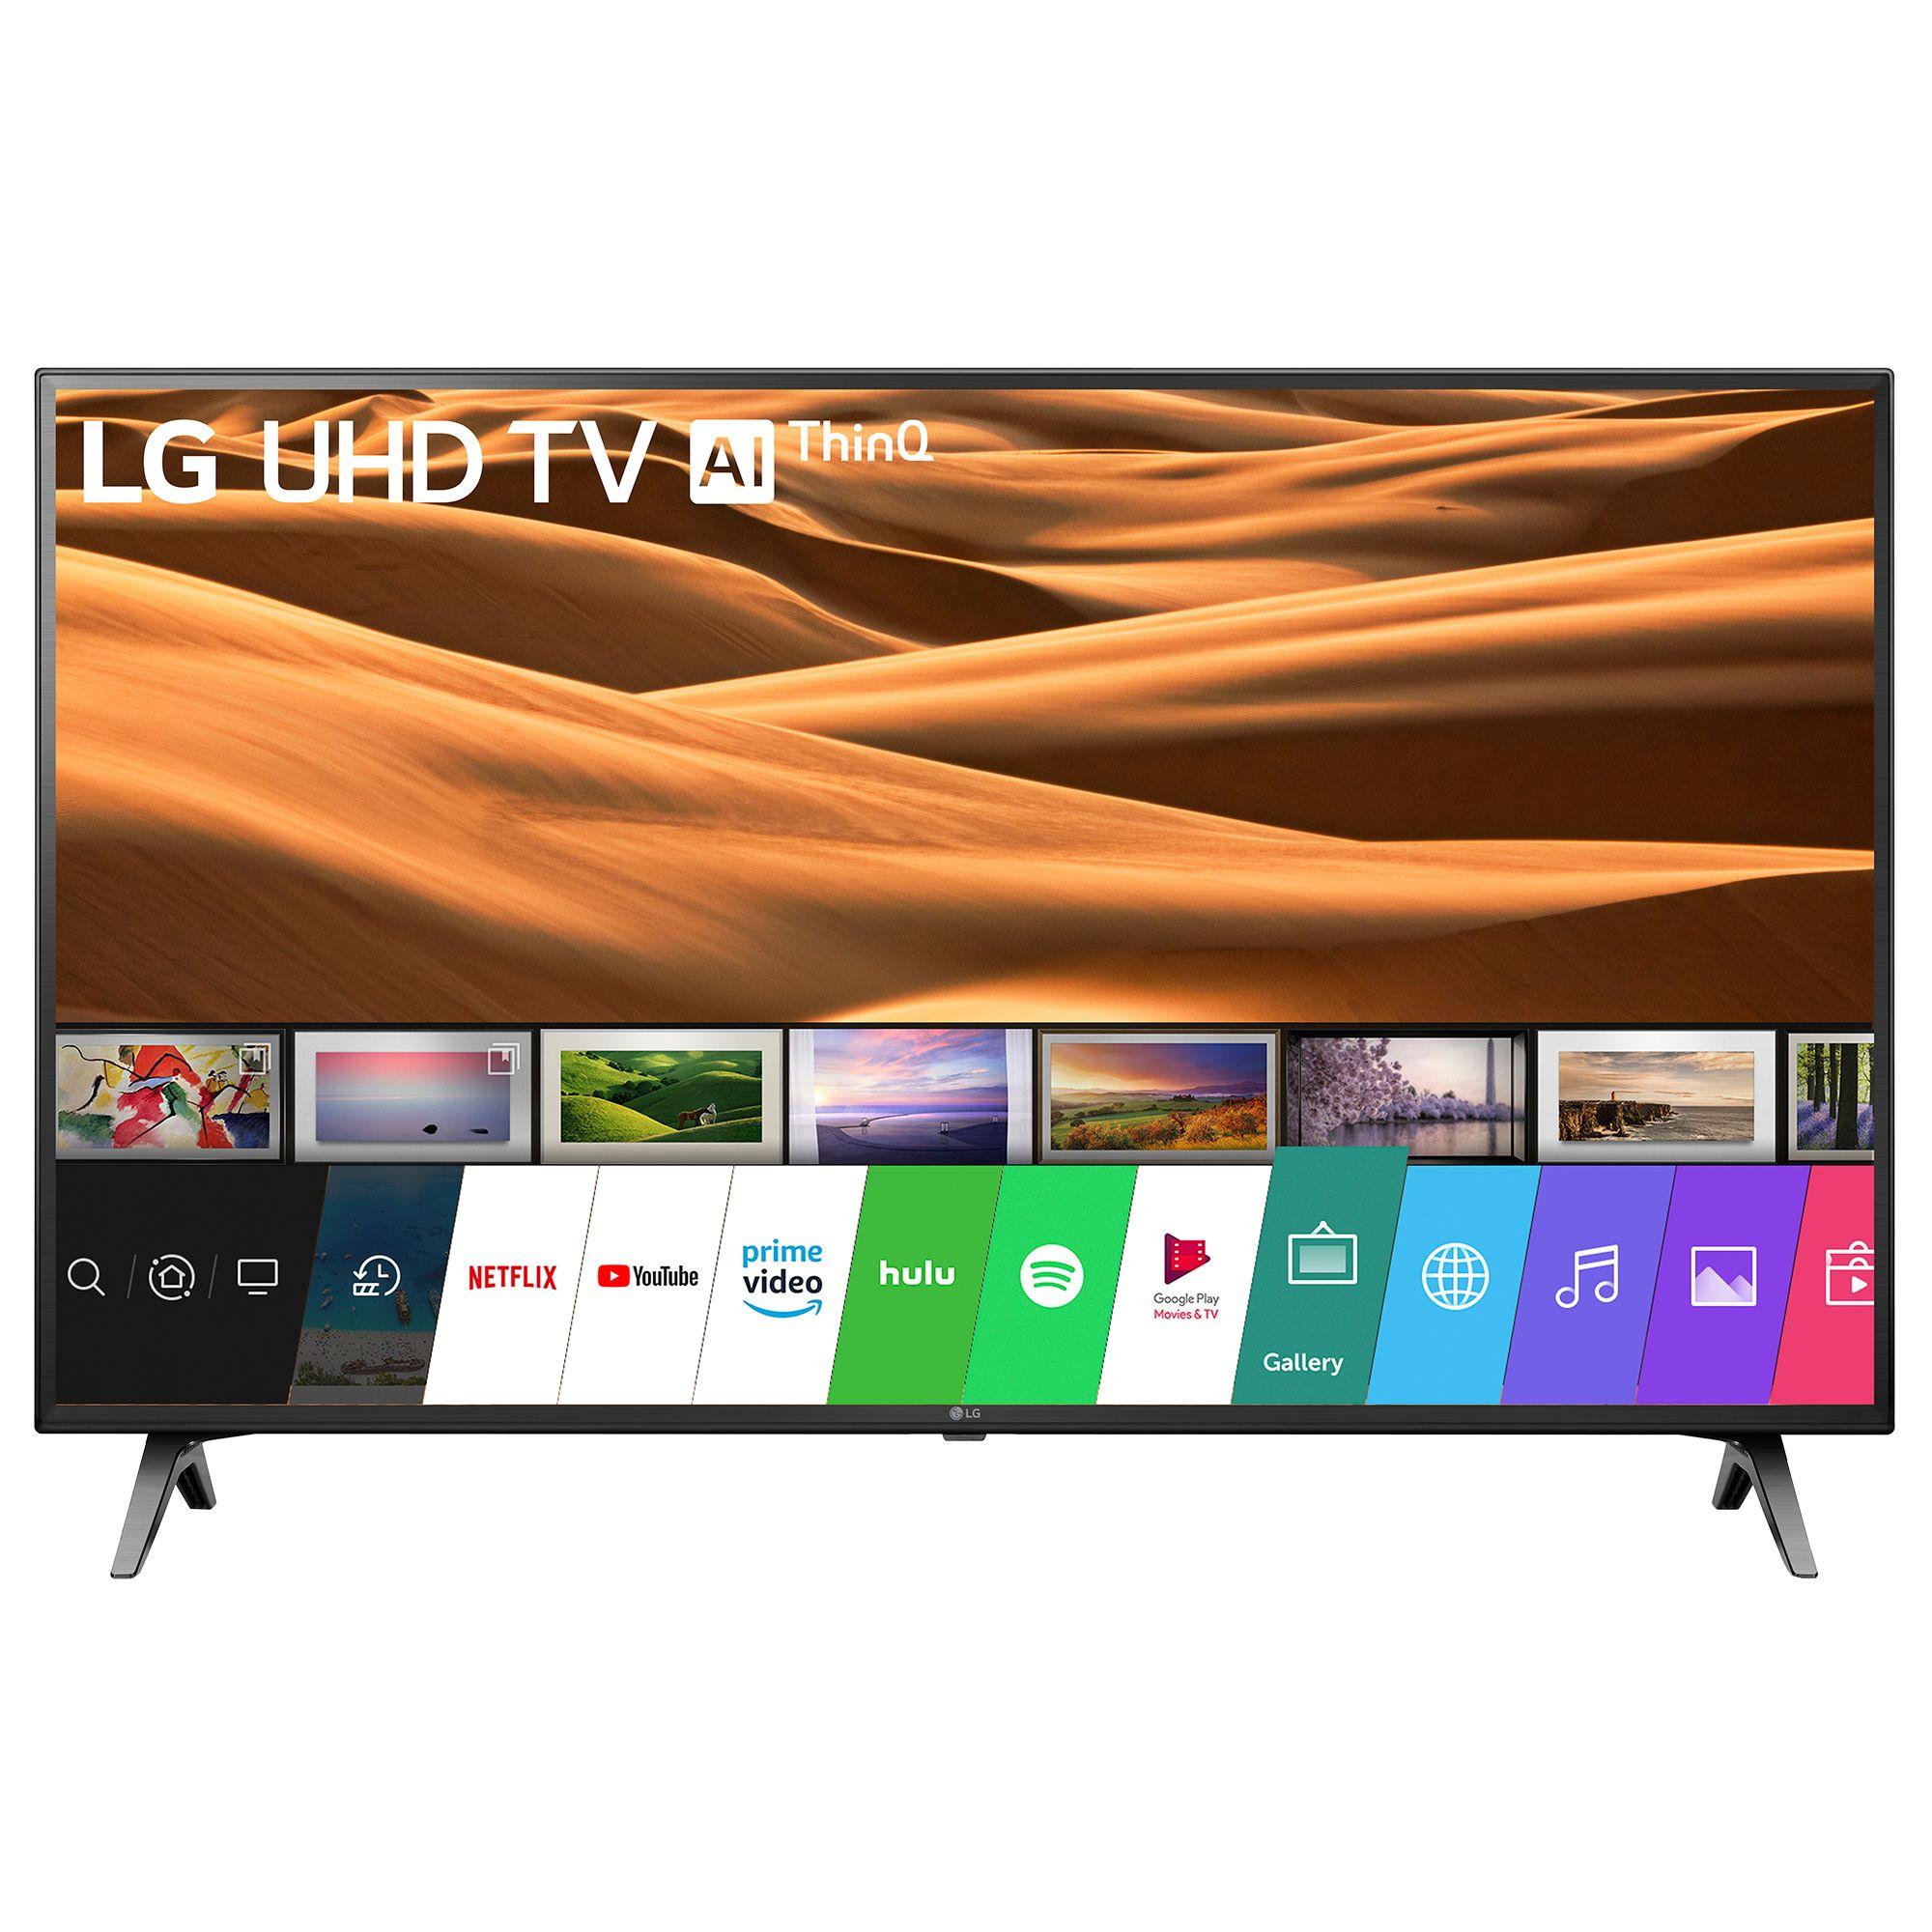 LG 49UM7100PLB, 123cm, smart, WiFi, BT, UHD